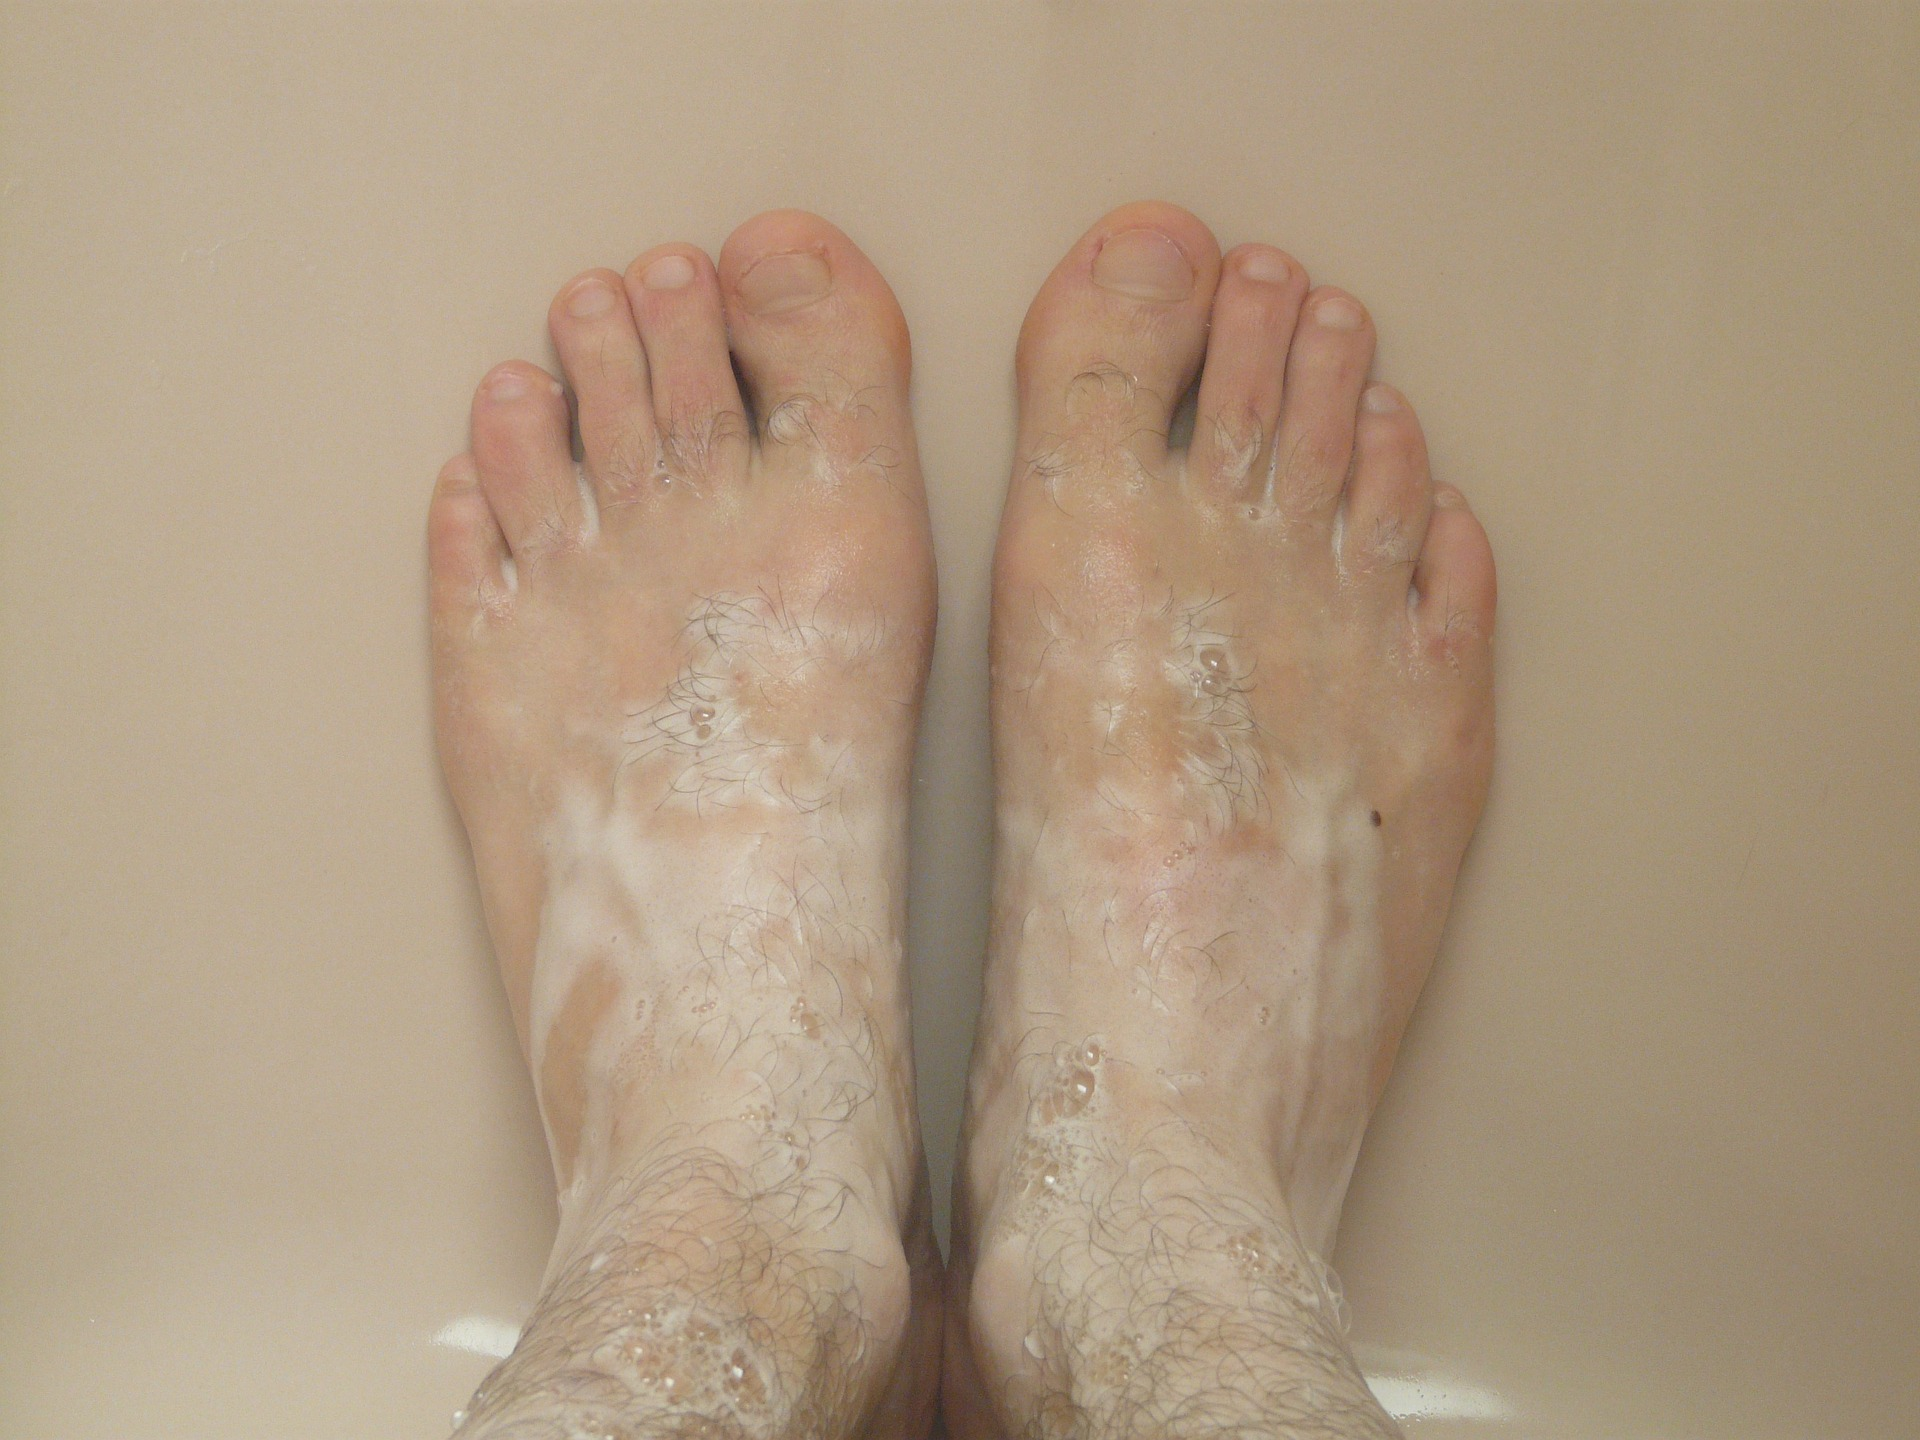 feet-16107_1920